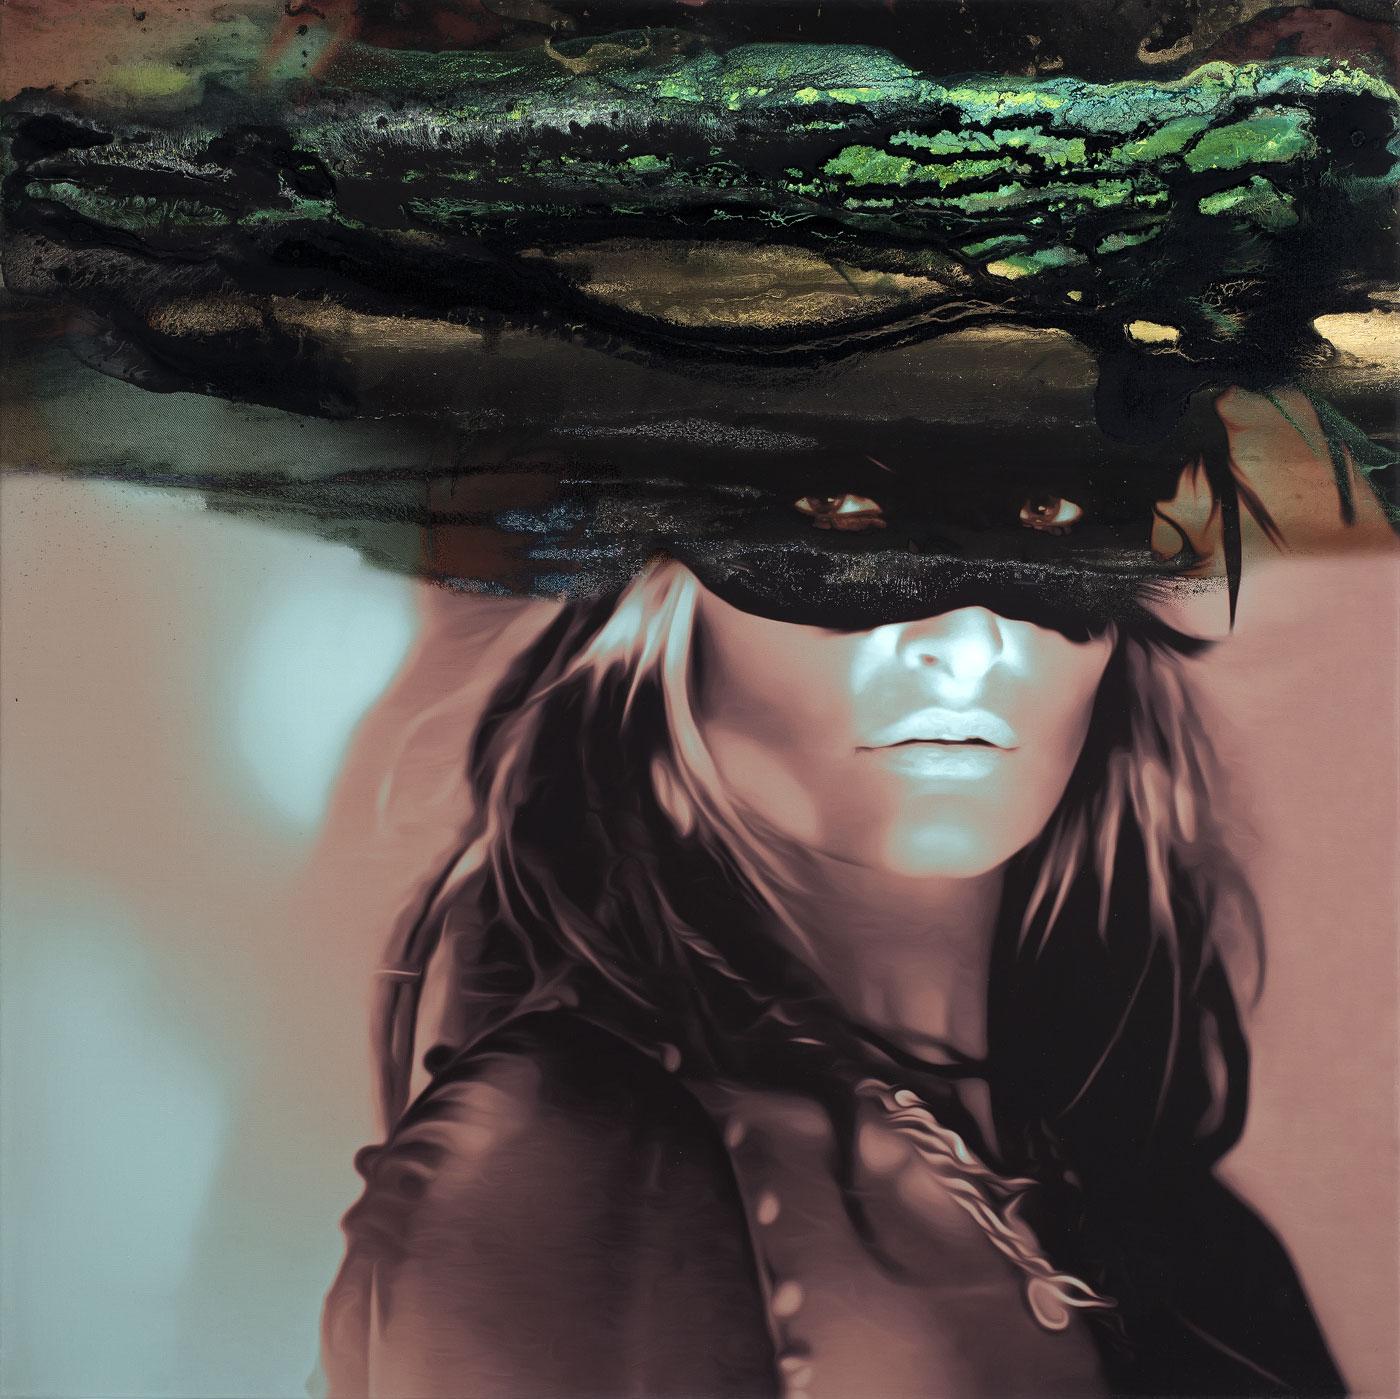 Skrytá podobizna TM, 2018, akryl a tisk na plátně, 100x100